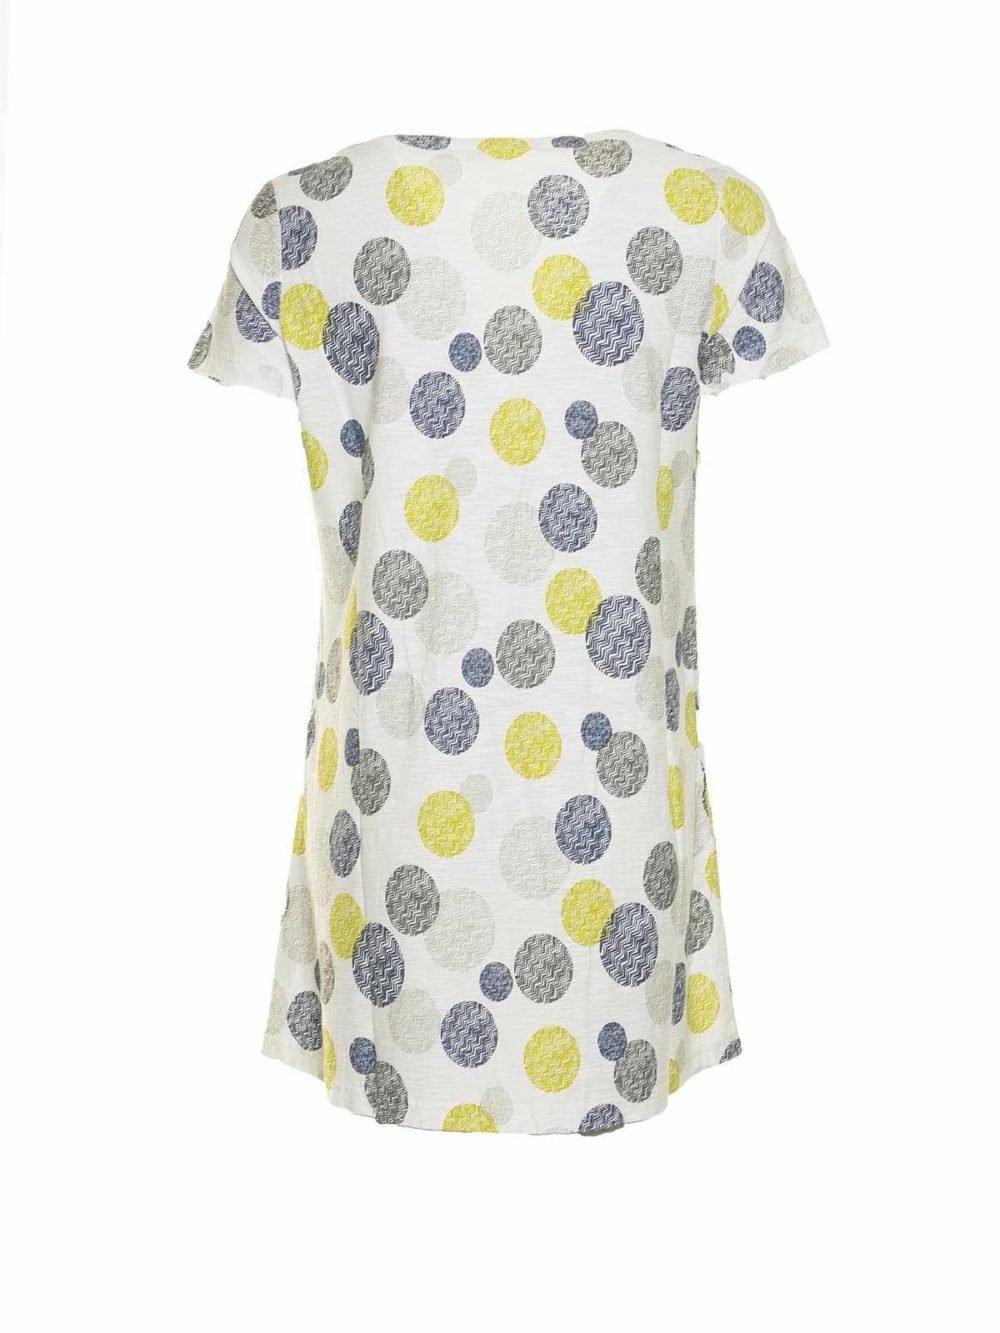 Tunic CHV-1502 Capri Katie Kerr Women's Clothing